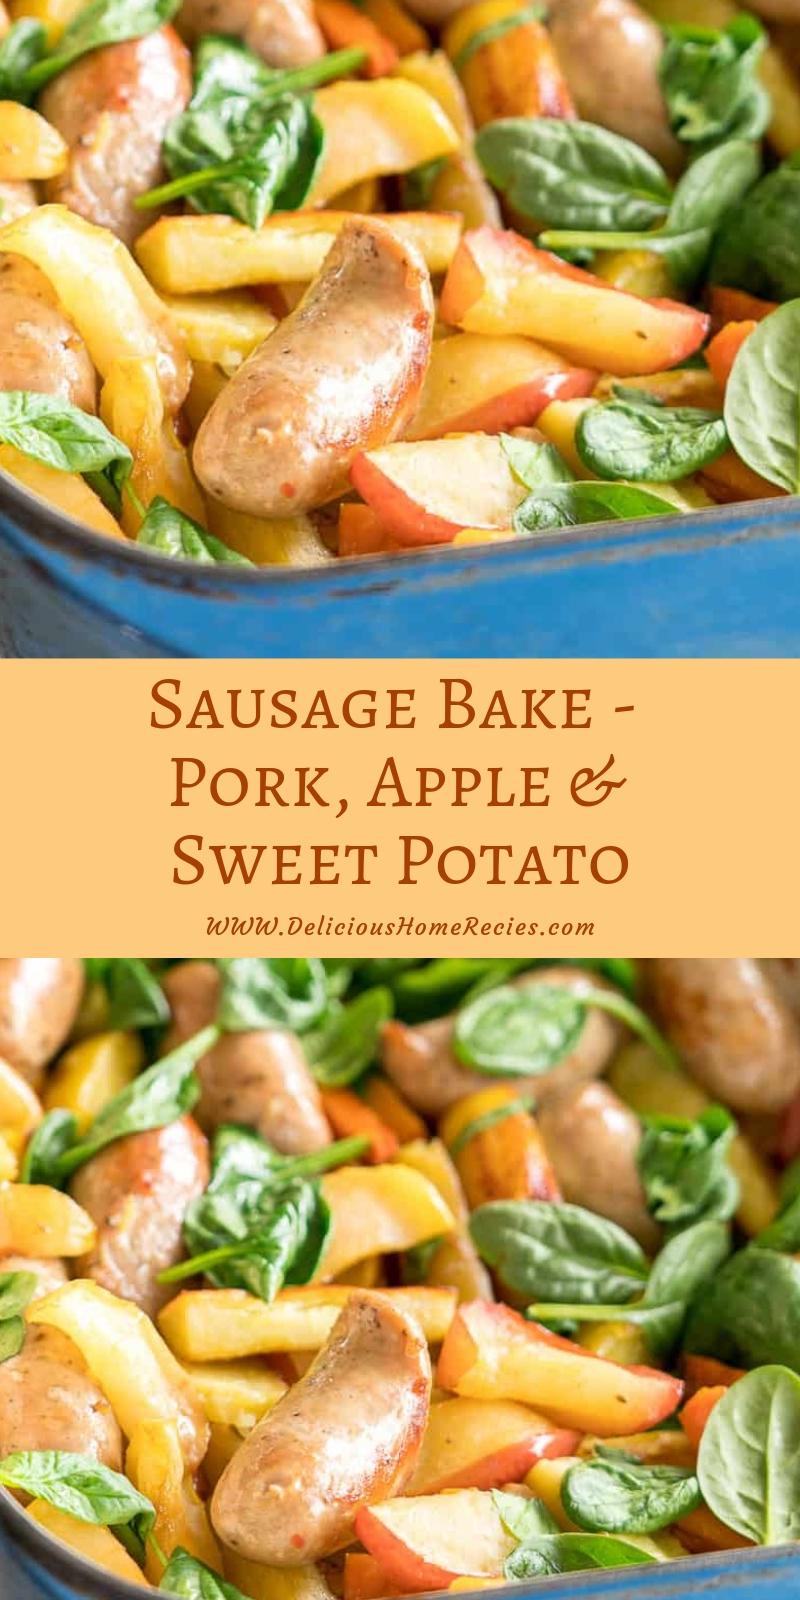 Sausage Bake - Pork, Apple & Sweet Potato